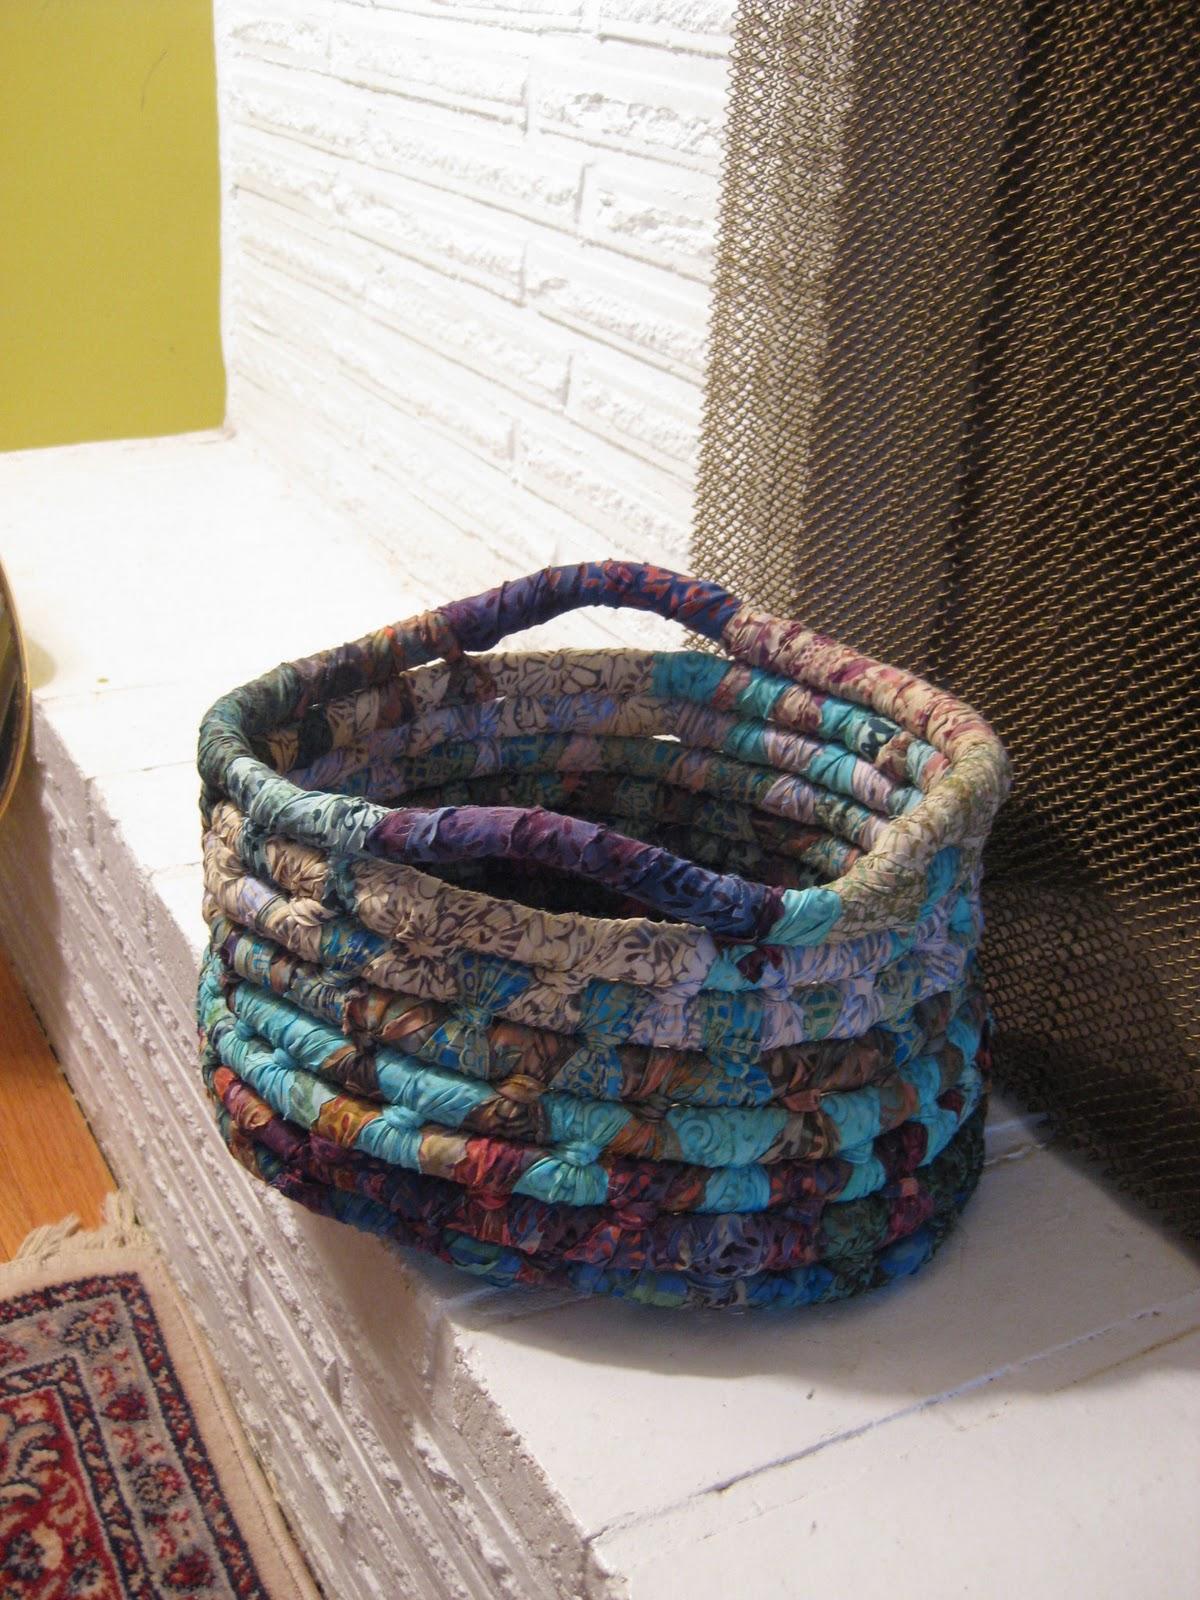 janae king designs chunky rope baskets. Black Bedroom Furniture Sets. Home Design Ideas